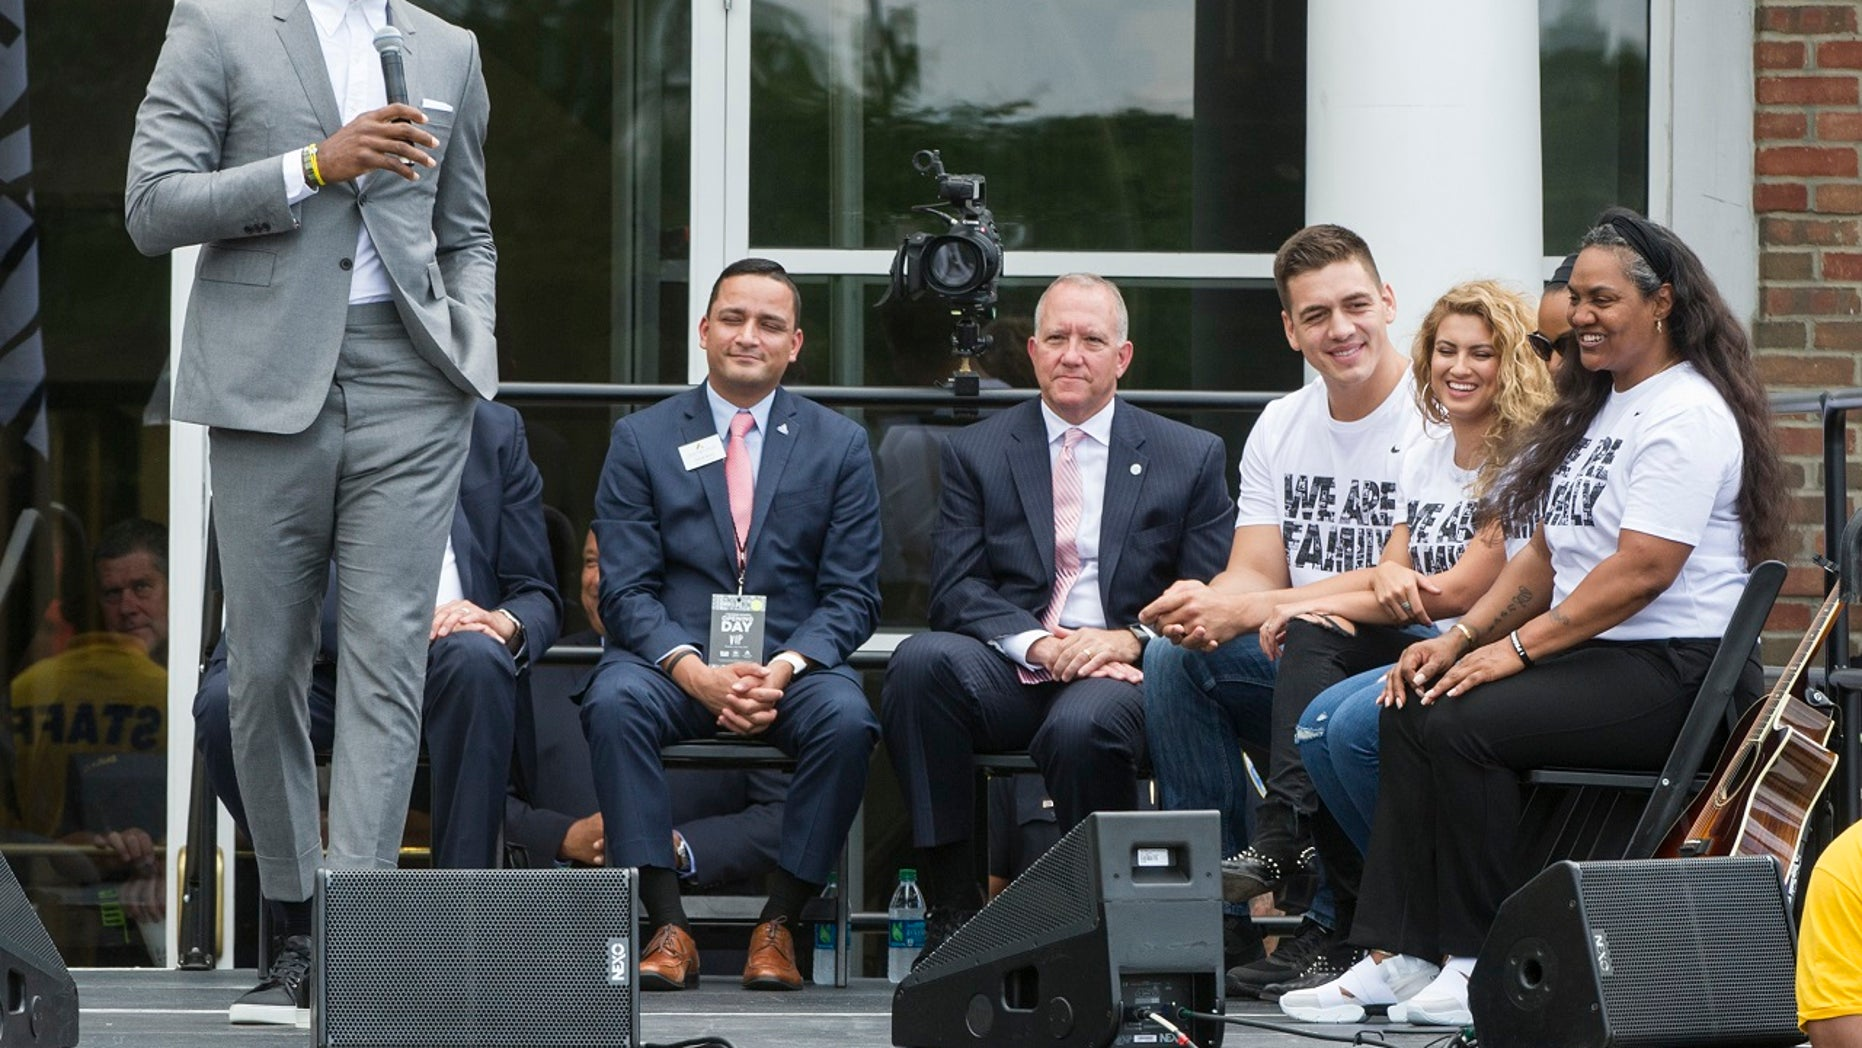 LeBron James unveils his I Promise School in Akron, Ohio.